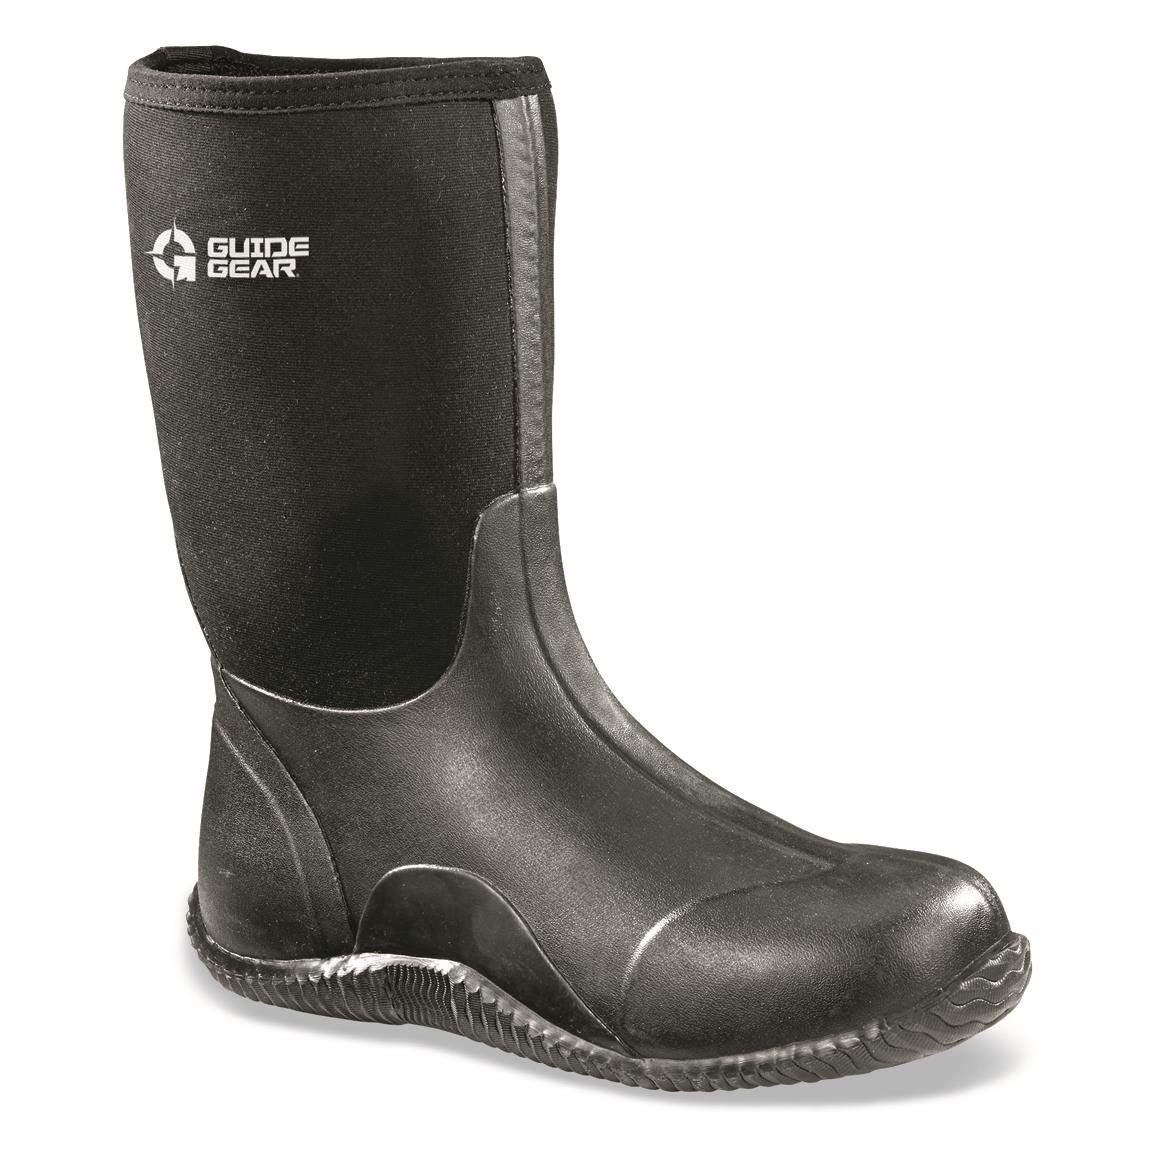 Guide Gear Men's Mid Bogger Waterproof Rubber Boots, Black, Black, 10D (Medium)